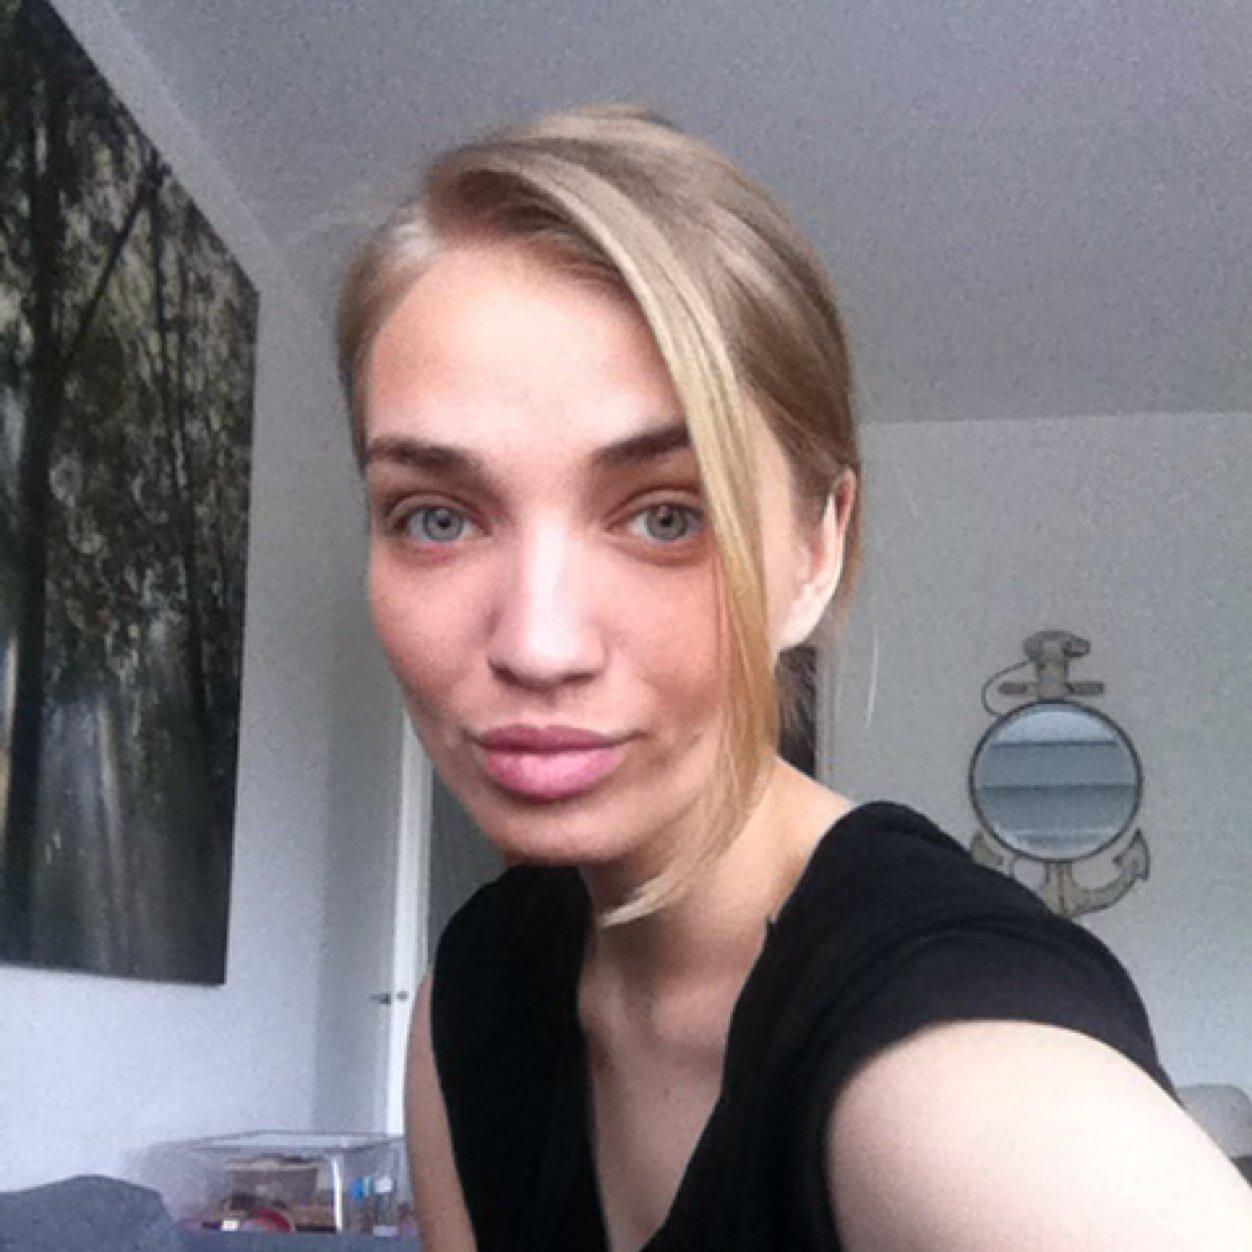 Images Anna Mari nudes (49 pics), Fappening